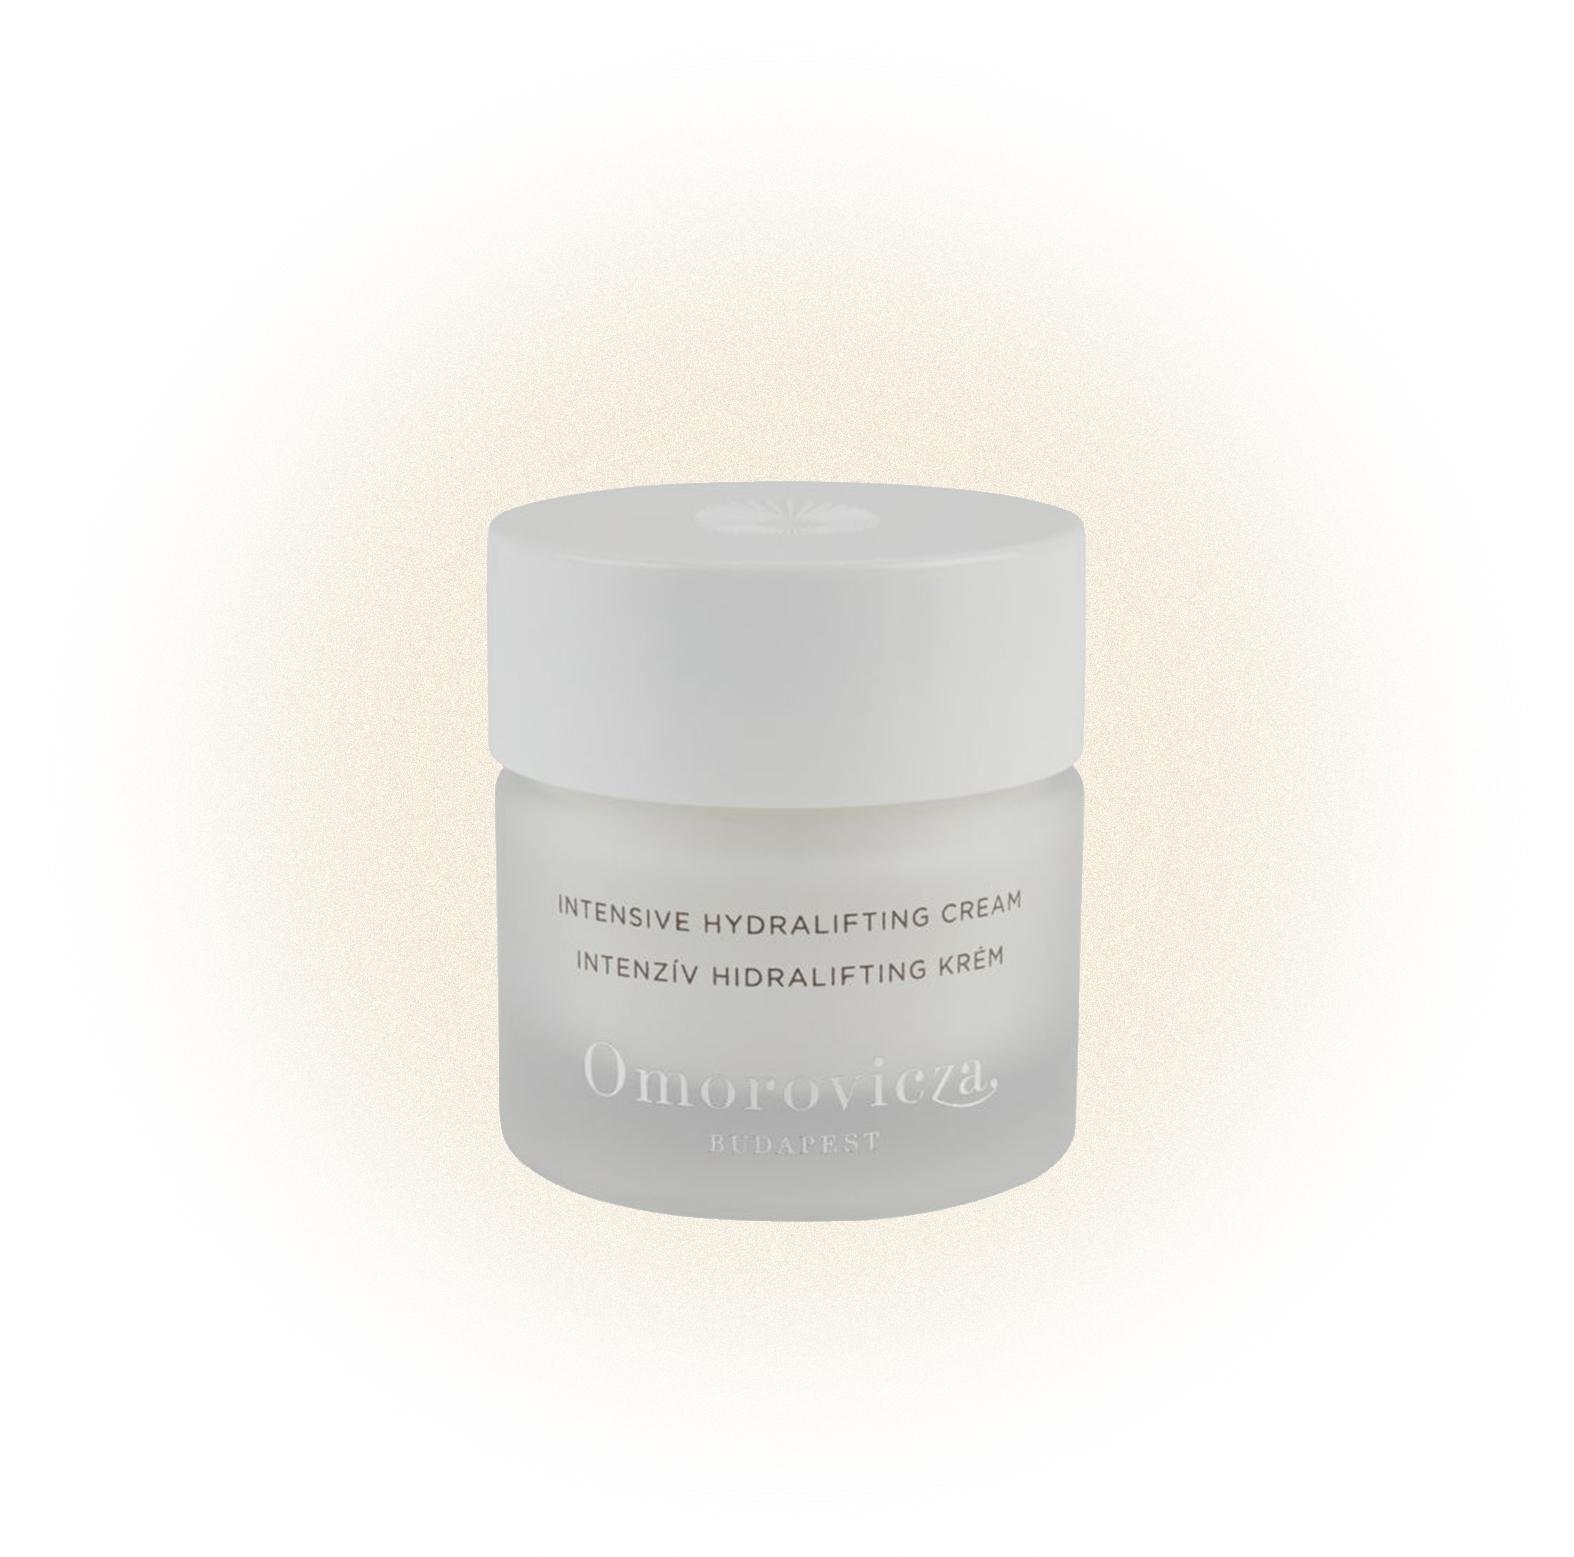 Интенсивный крем Intensive Hydralifting Cream